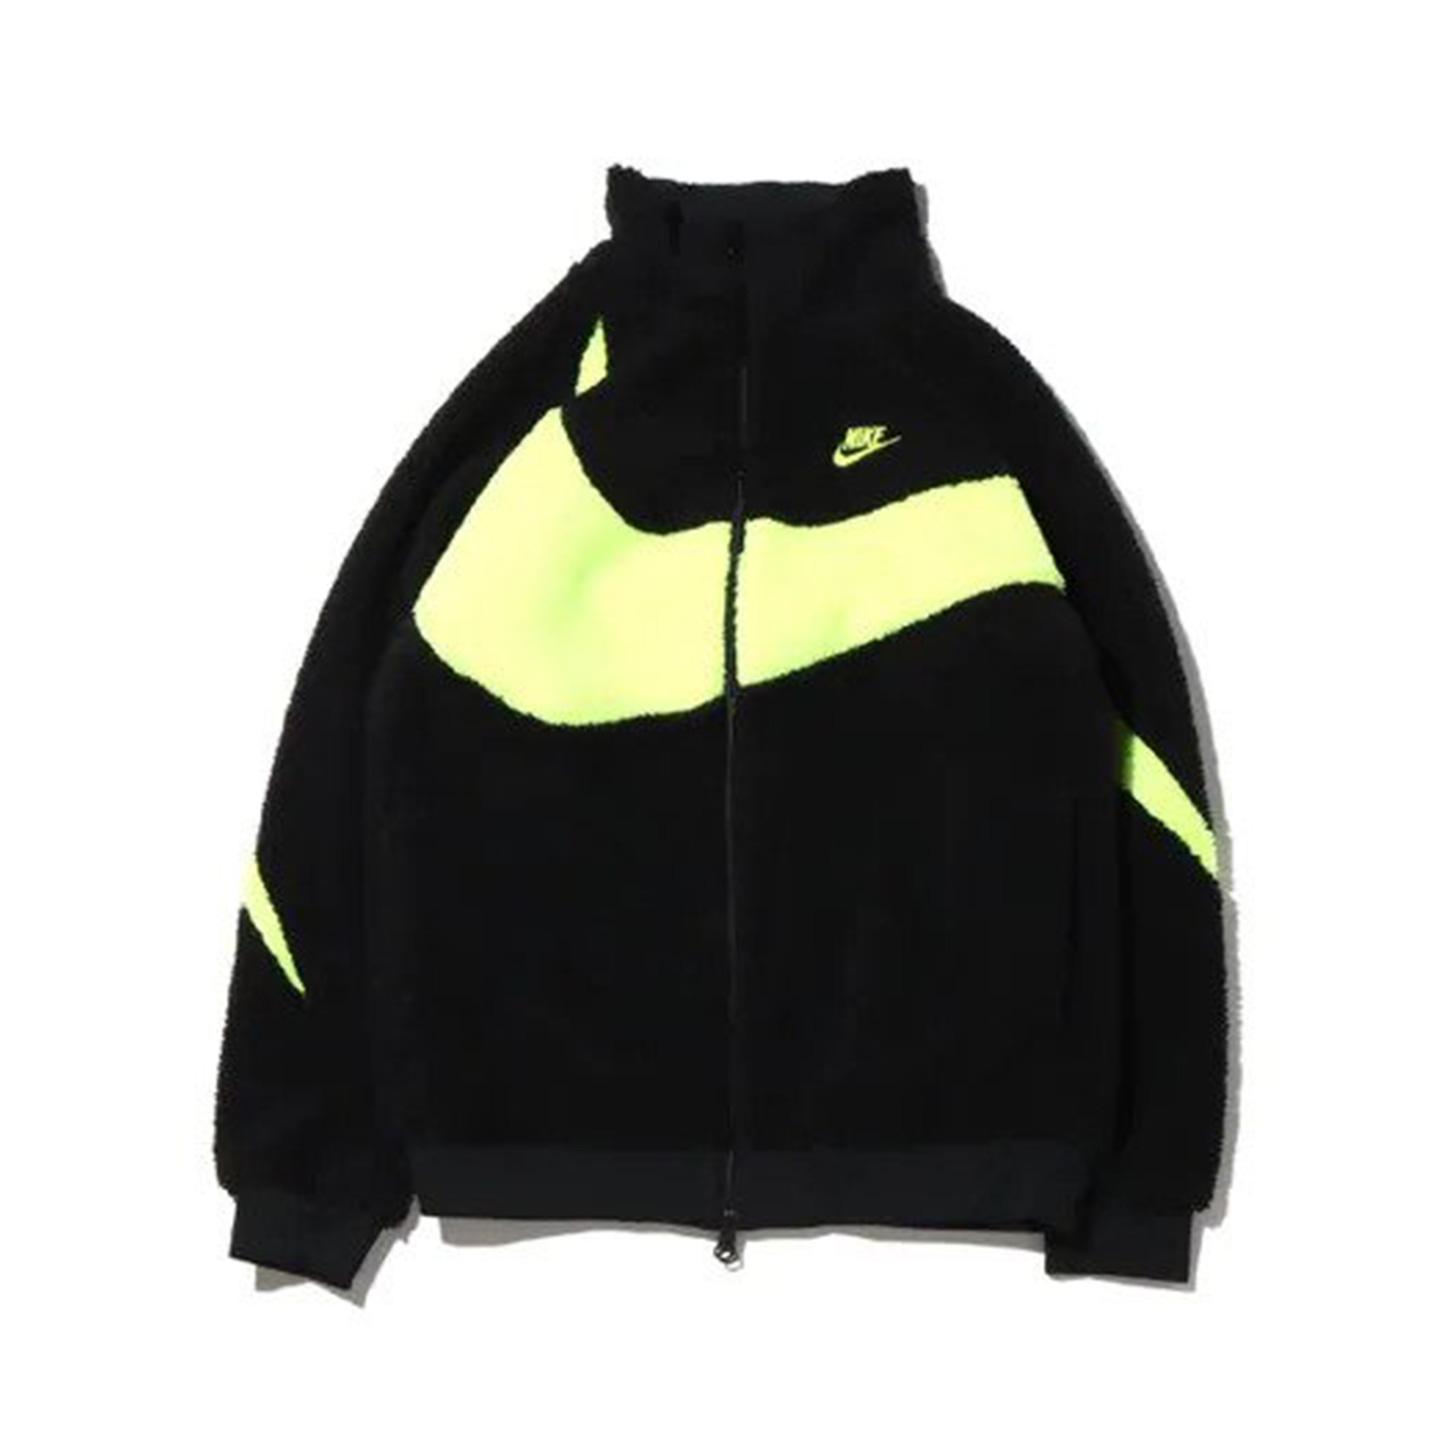 Nike VM Big Swoosh Full Zip Jacket Black Volt